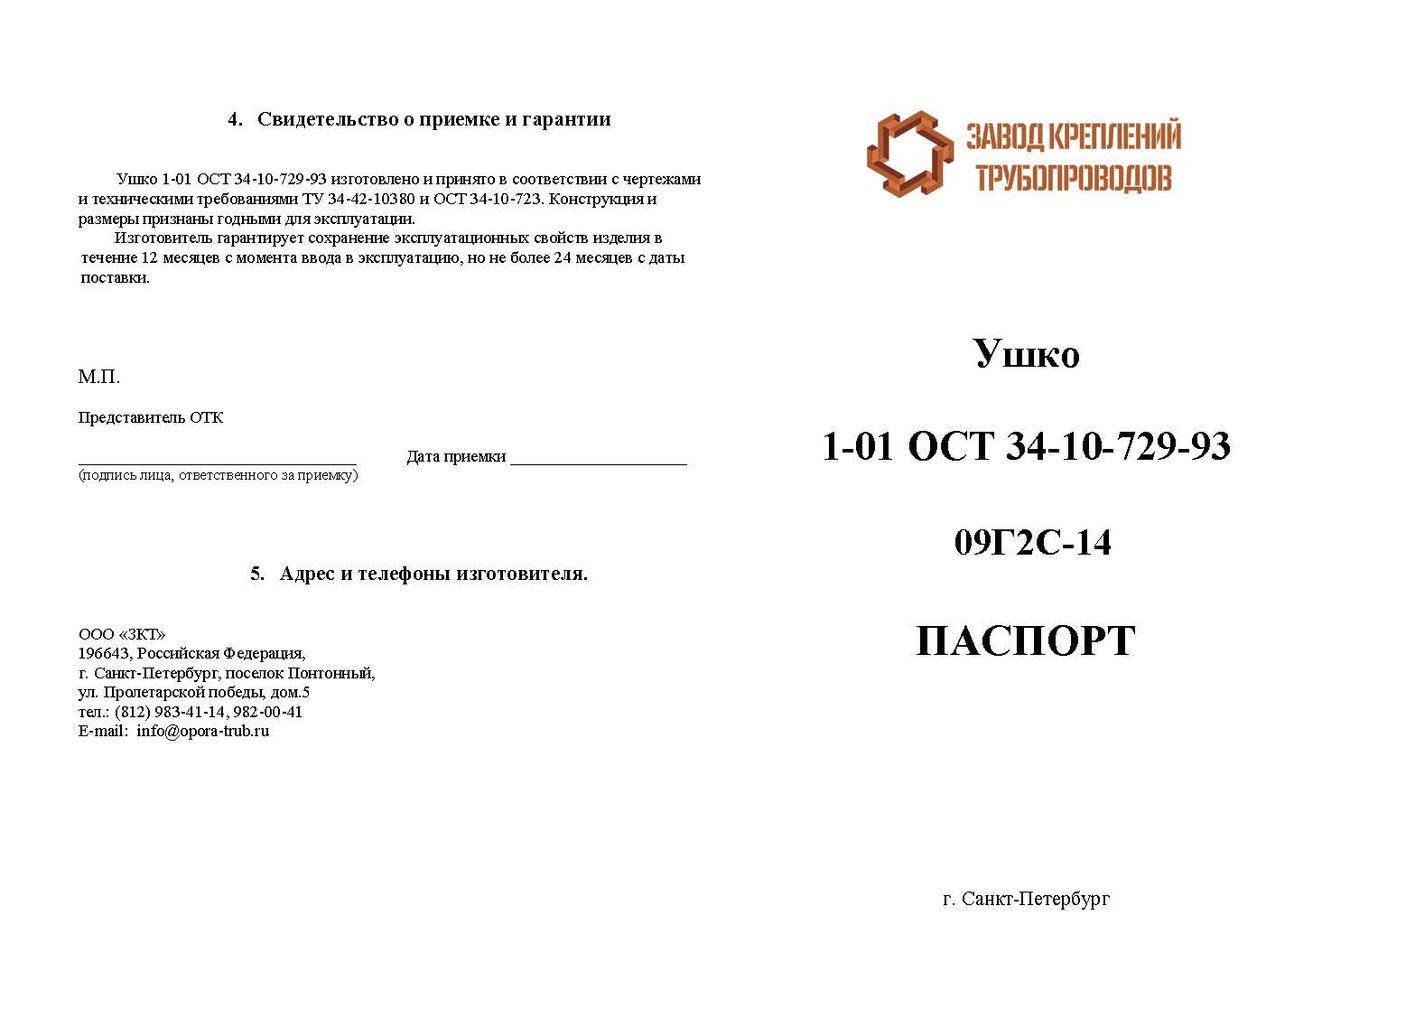 Паспорт Ушко 1-01 ОСТ 34-10-729-93 стр.1